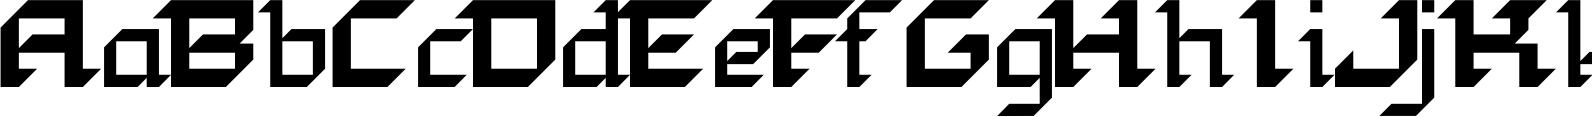 Display Chamfer